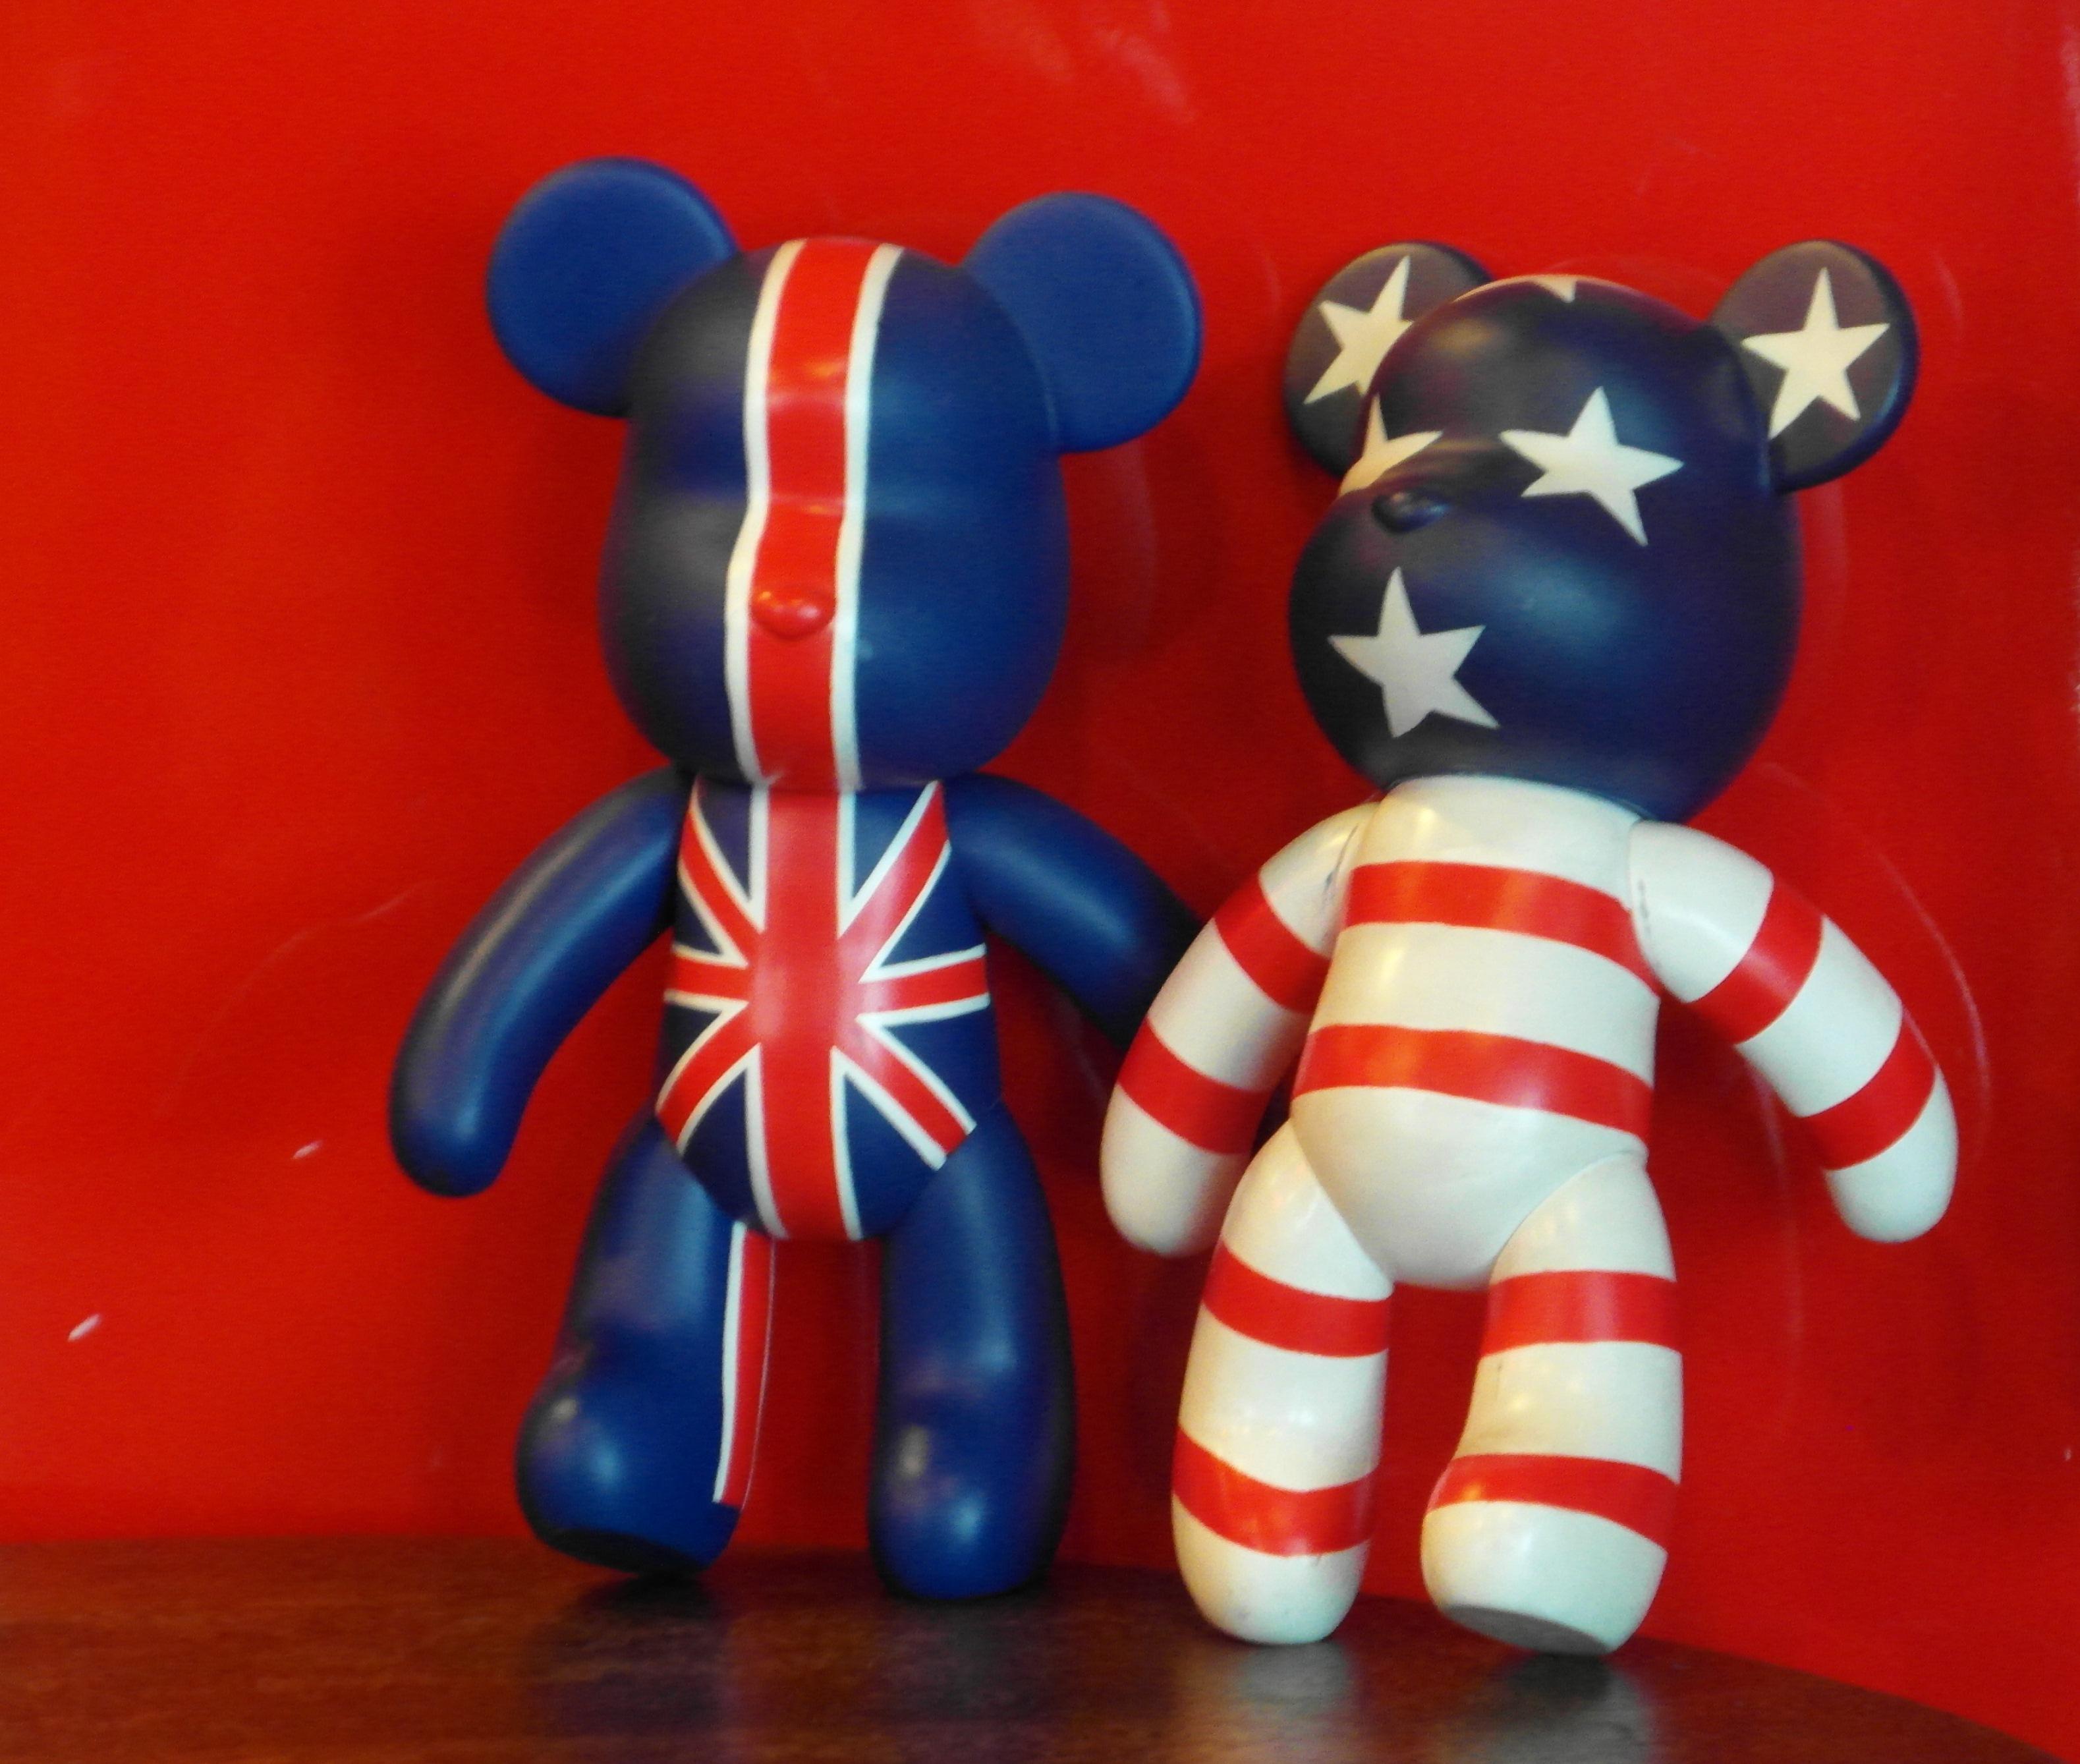 USA UK Teddy Bears, America, Political, Uk, Two, HQ Photo